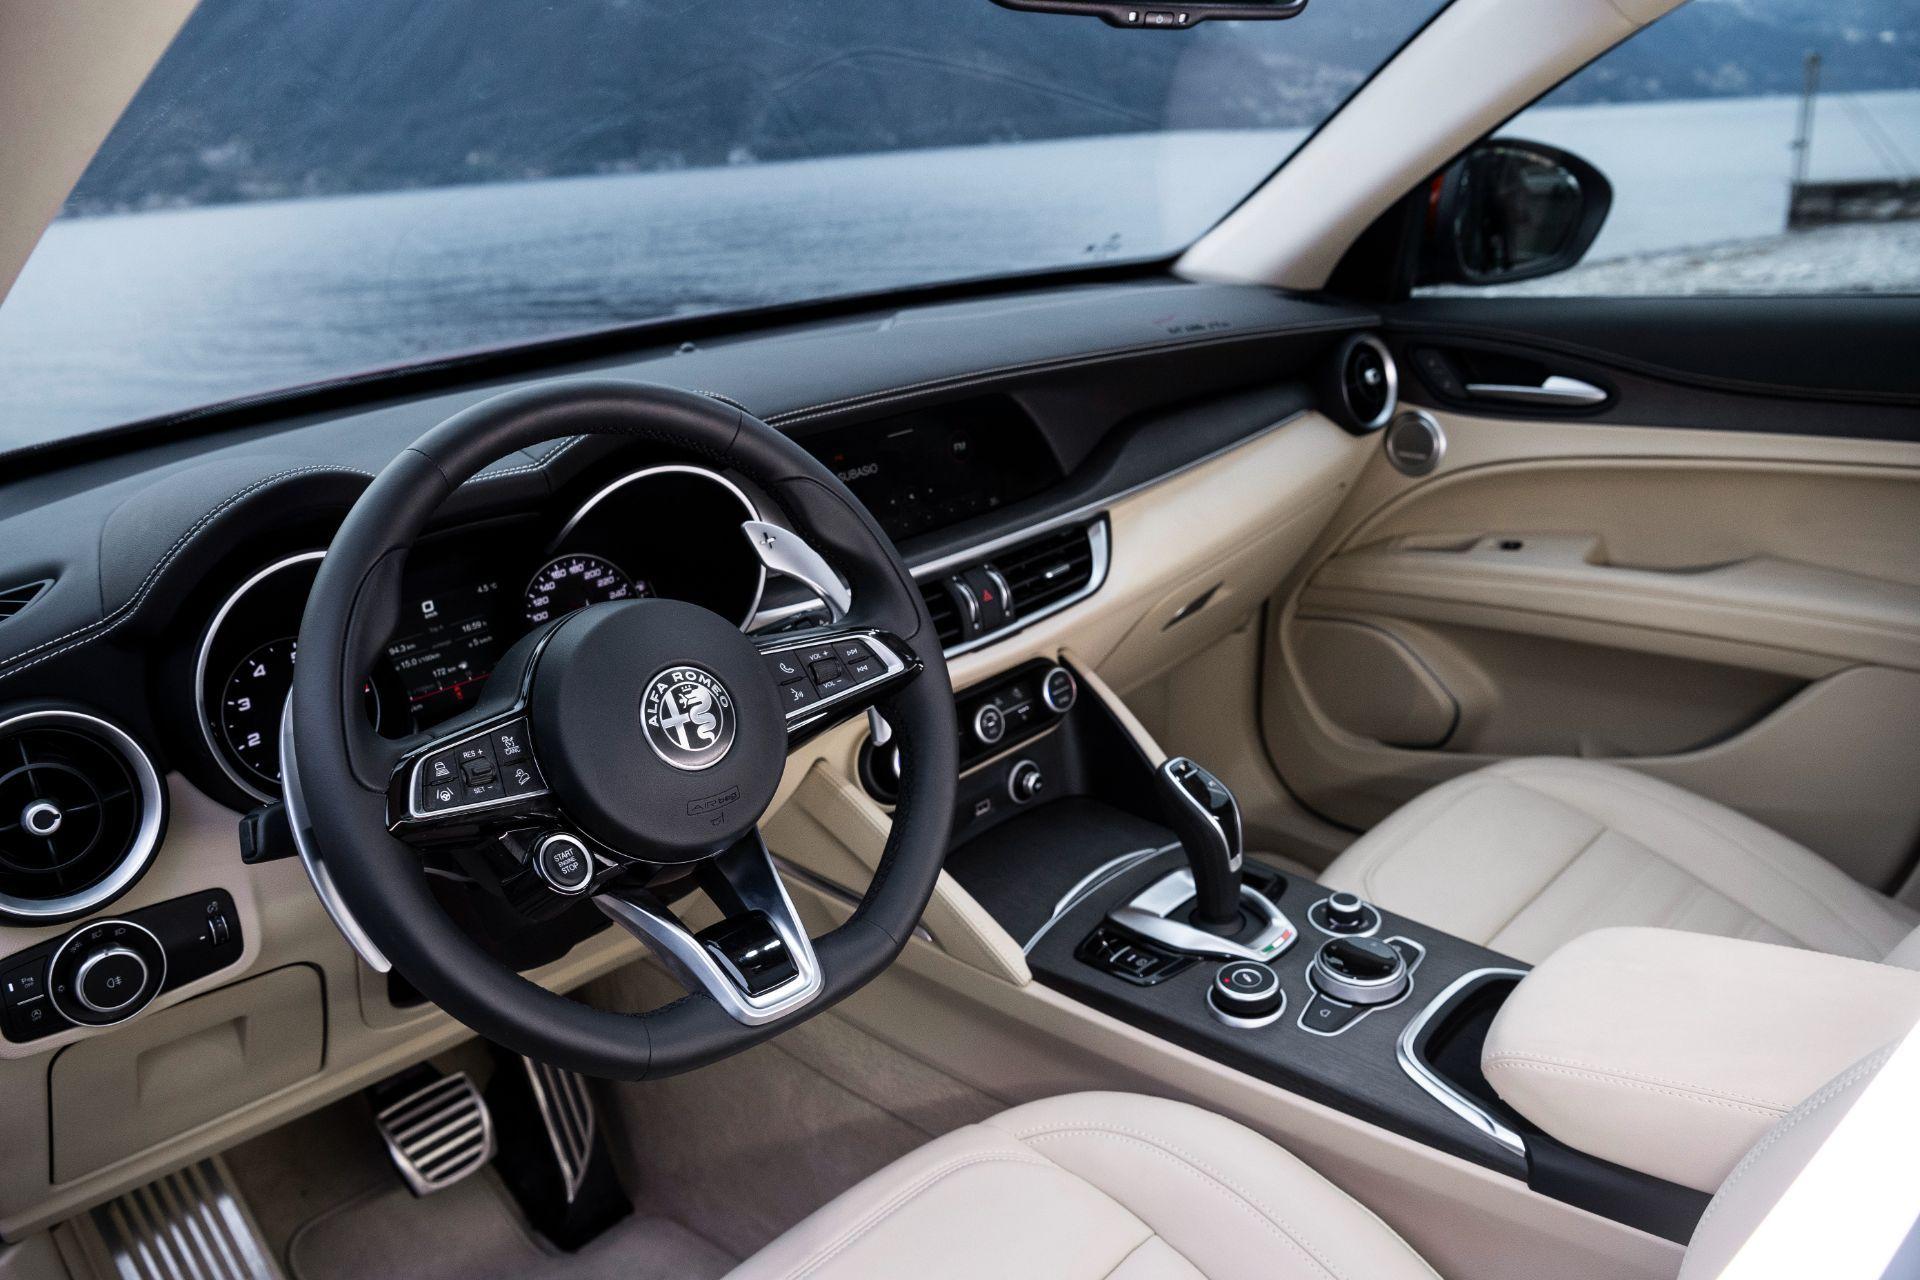 Alfa-Romeo-Giulia-and-Stelvio-6C-Villa-dEste-9